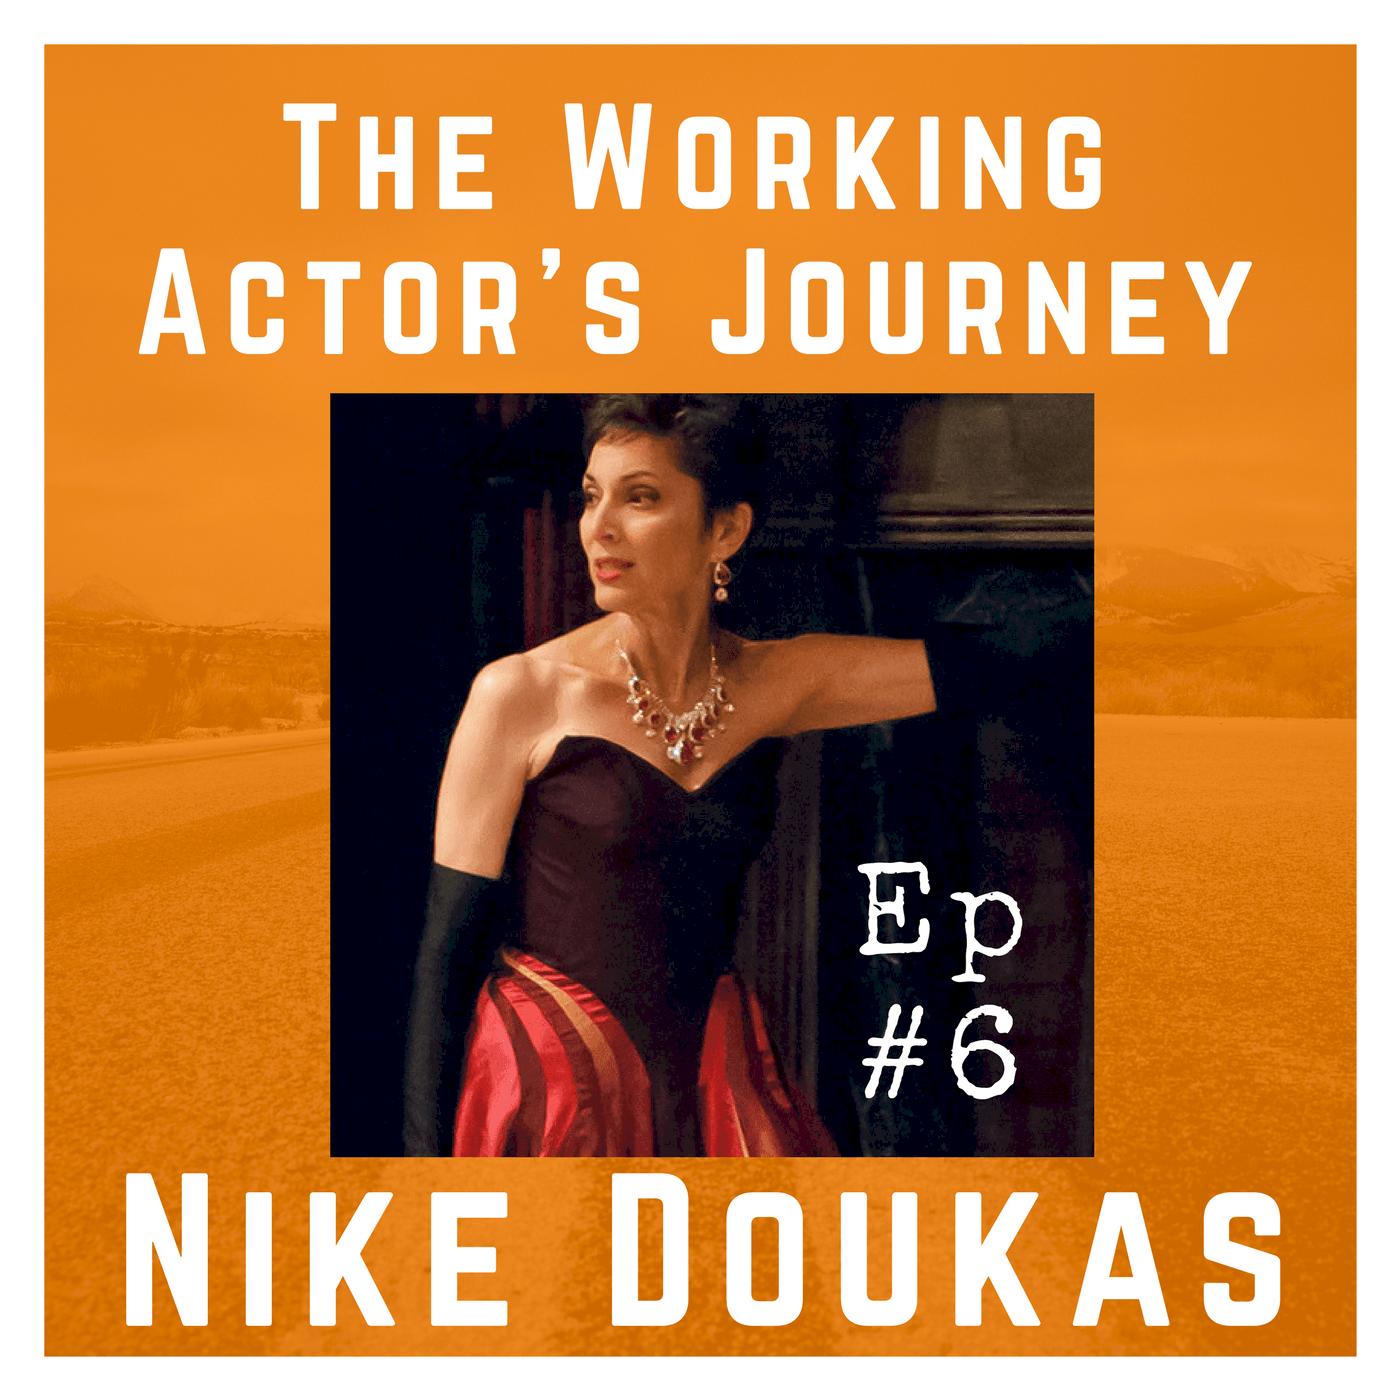 Ep 6 with Nike Doukas